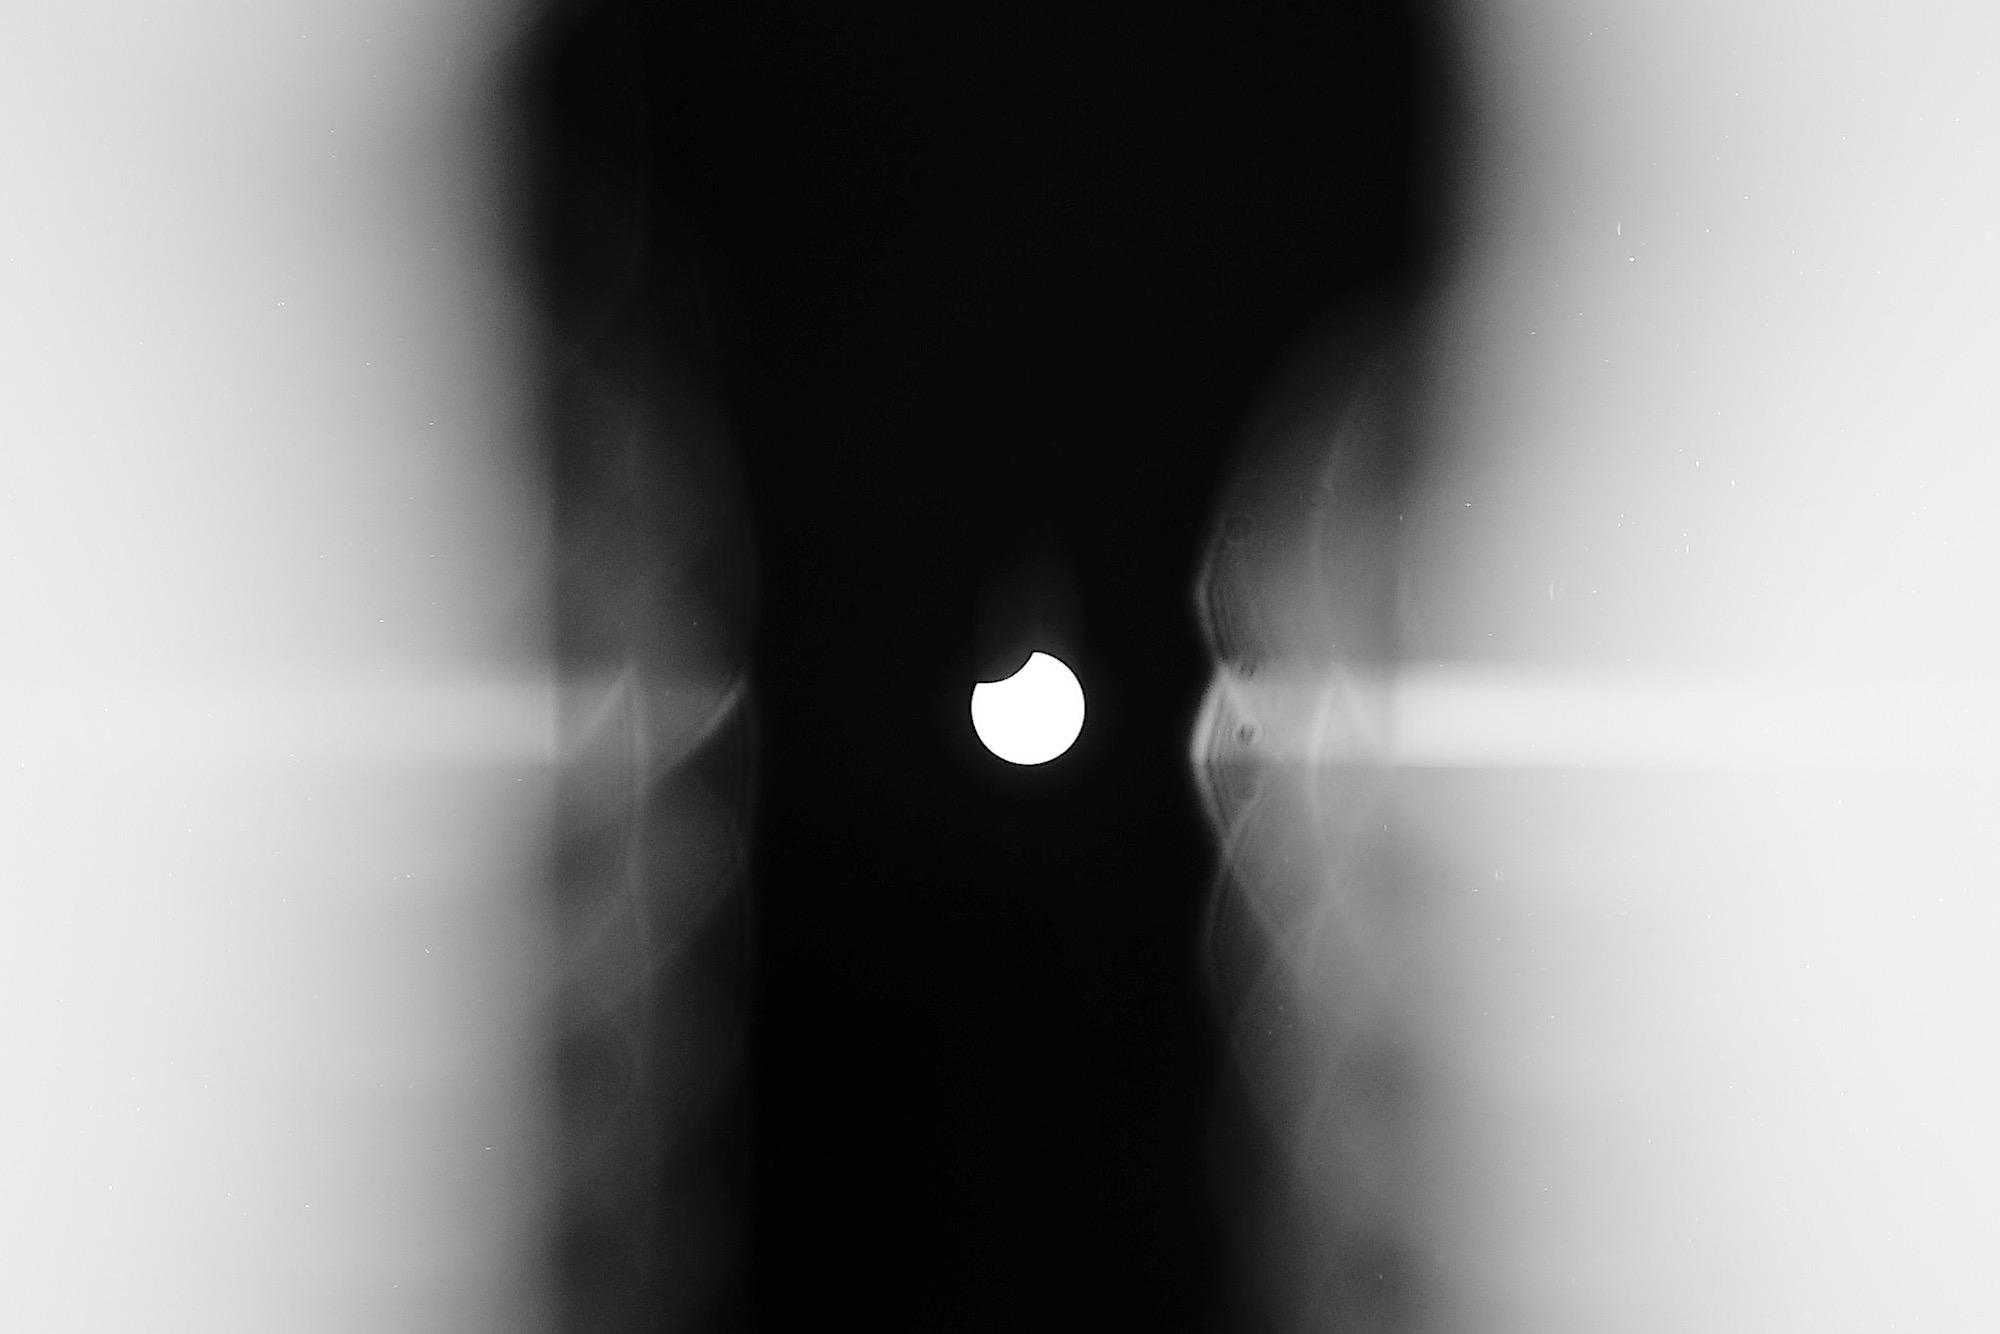 zonsverduistering1 - 1